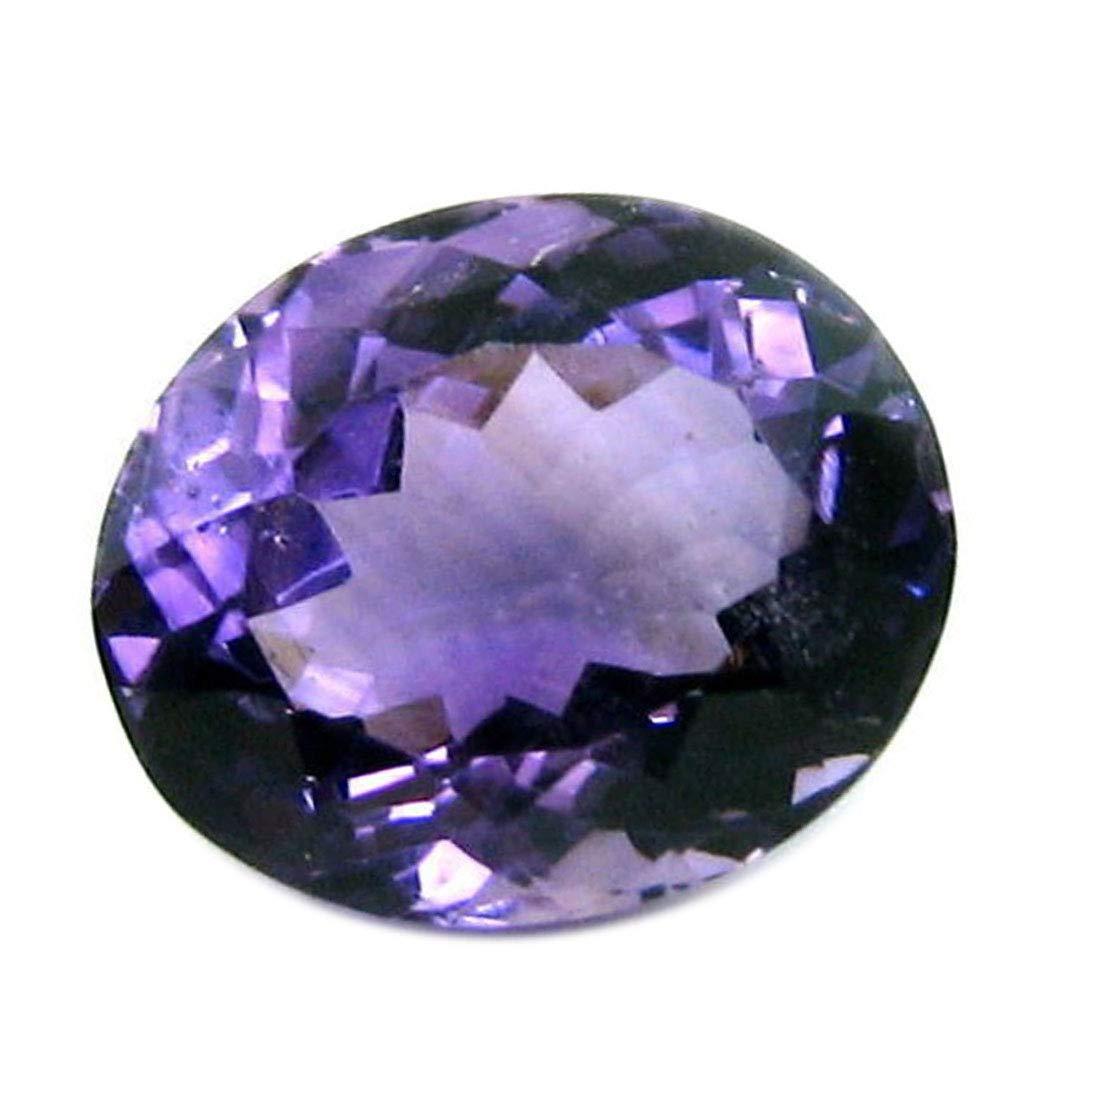 Gemsyogi 14X10 MM Genuine Amethyst Stone Purple Oval Faceted Loose Gemstone For Jewellery Making